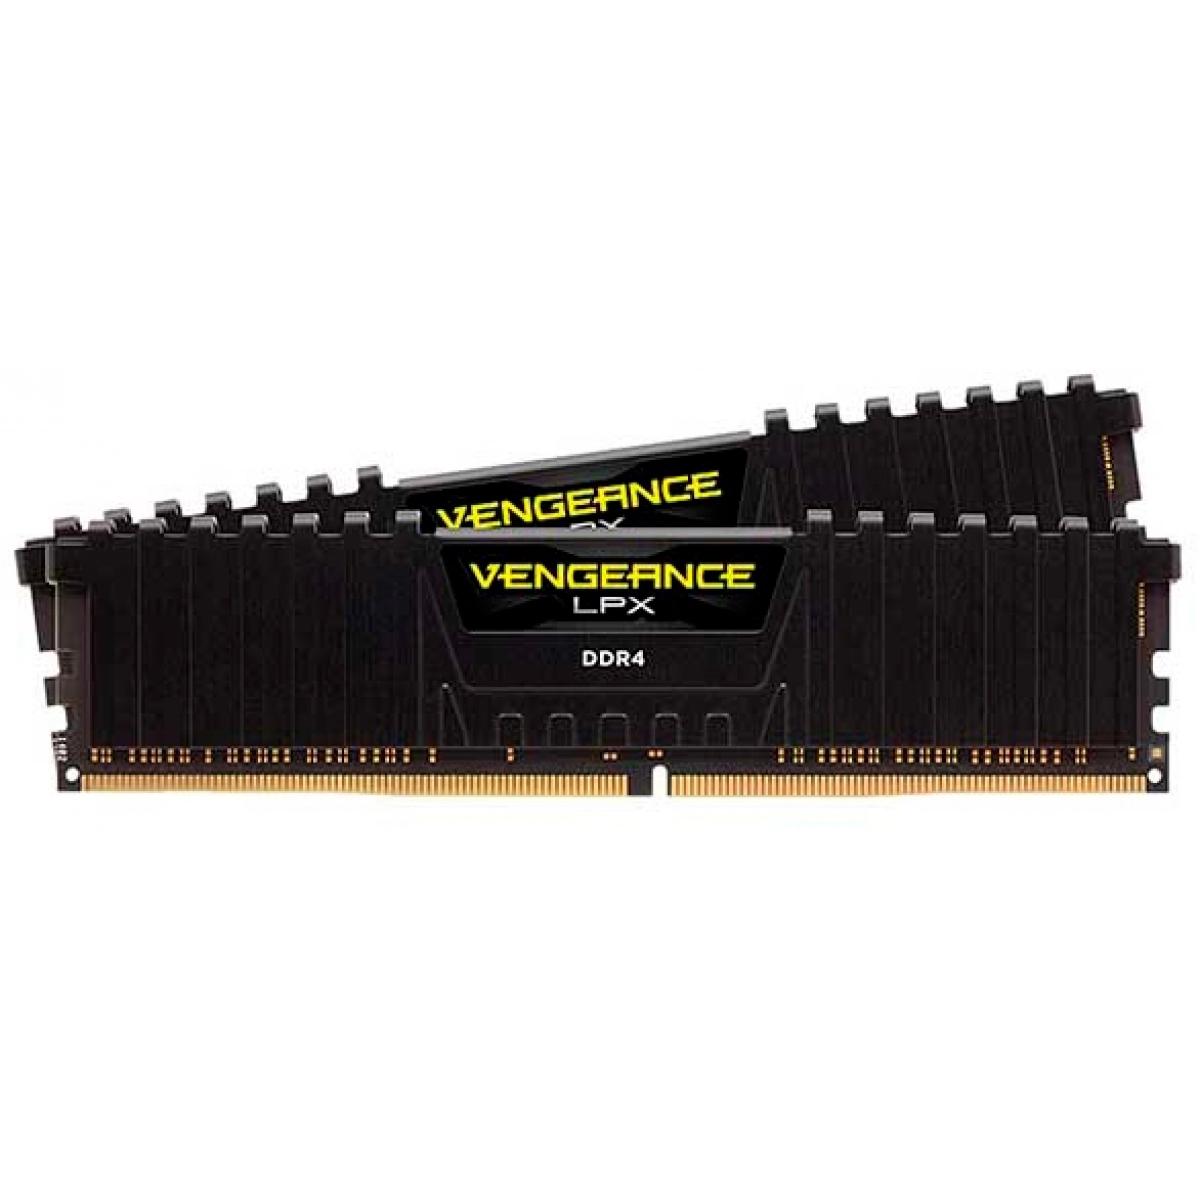 Memória DDR4 Corsair Vengeance LPX, 16GB (2x8GB) 3000MHz, CMK16GX4M2D3000C16